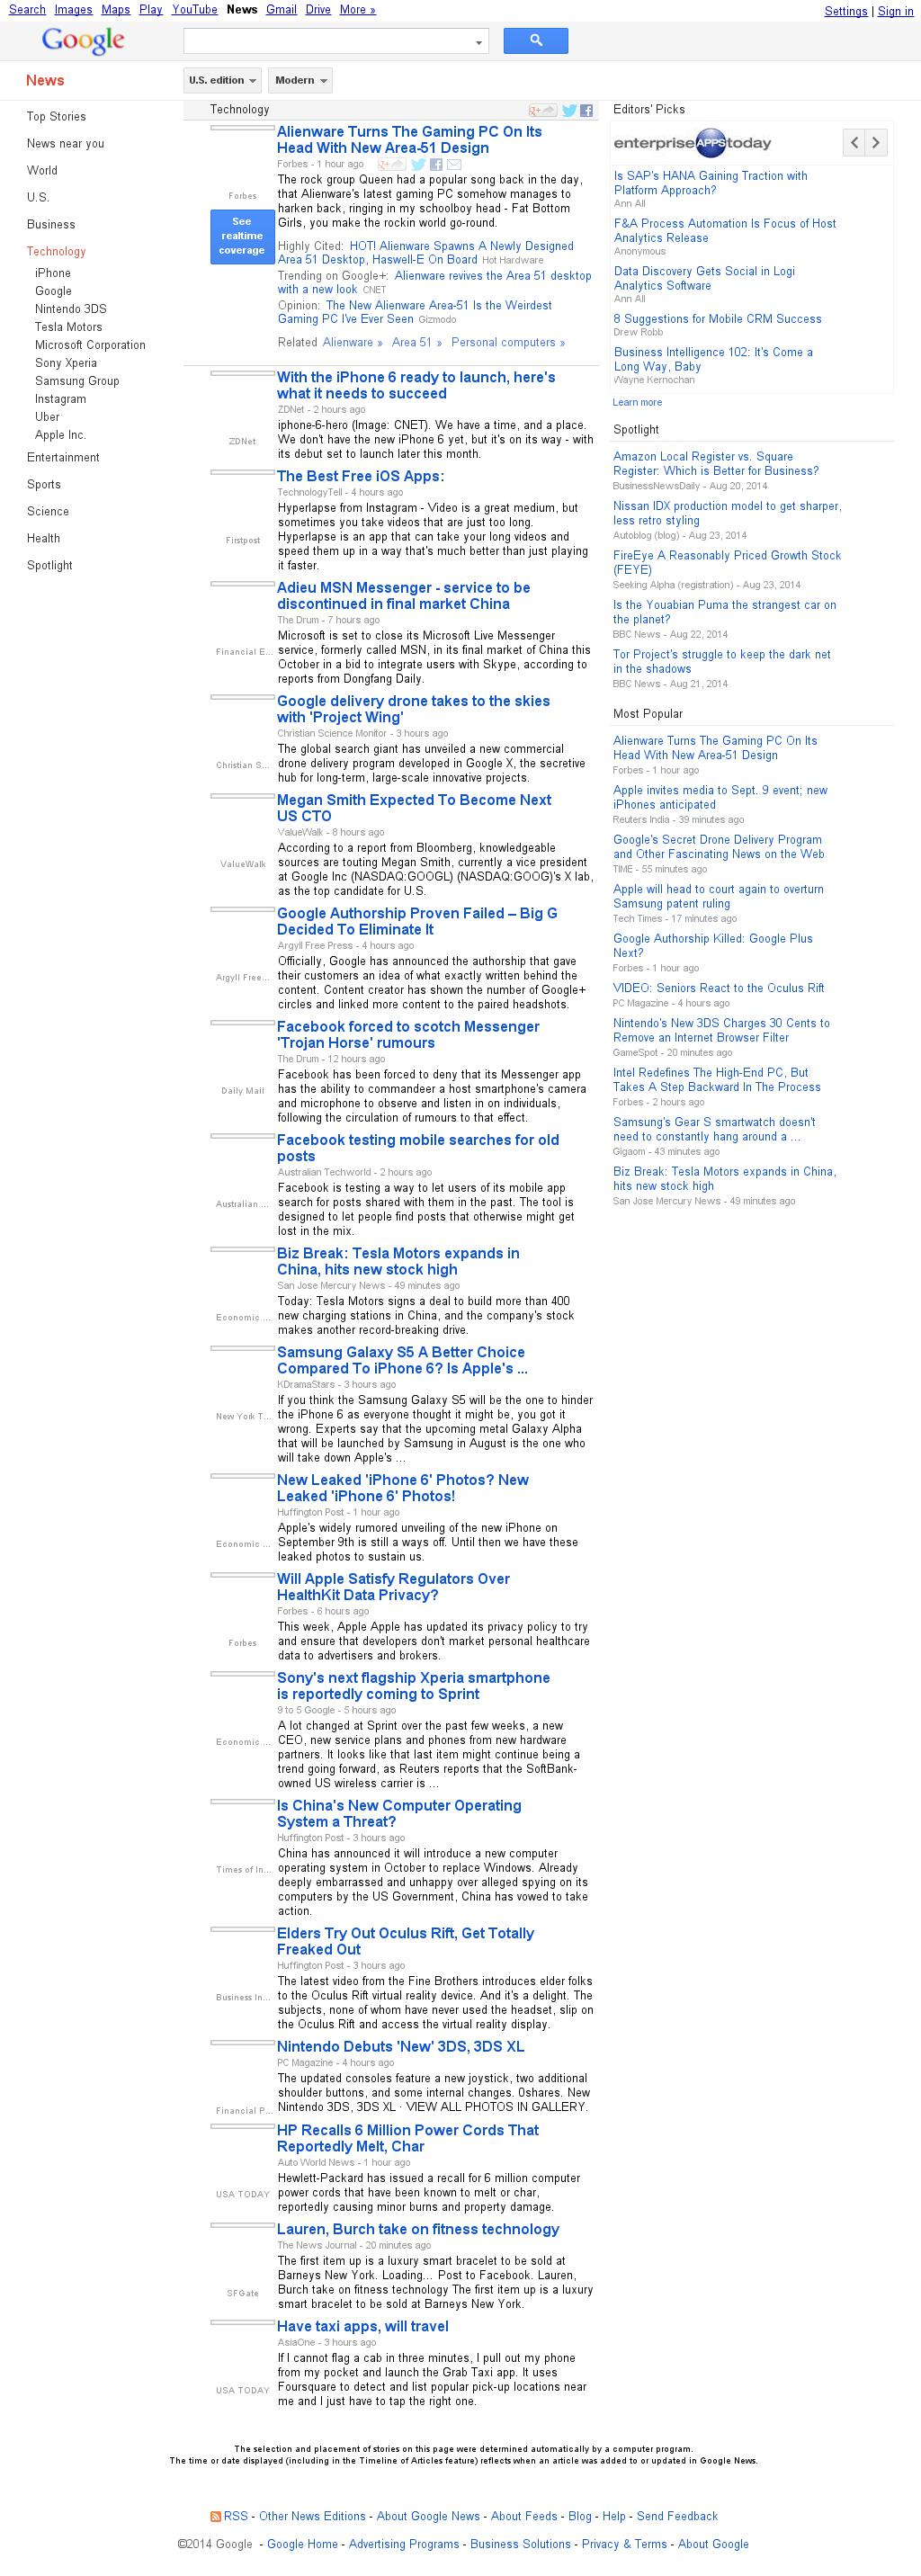 Google News: Technology at Friday Aug. 29, 2014, 10:07 p.m. UTC